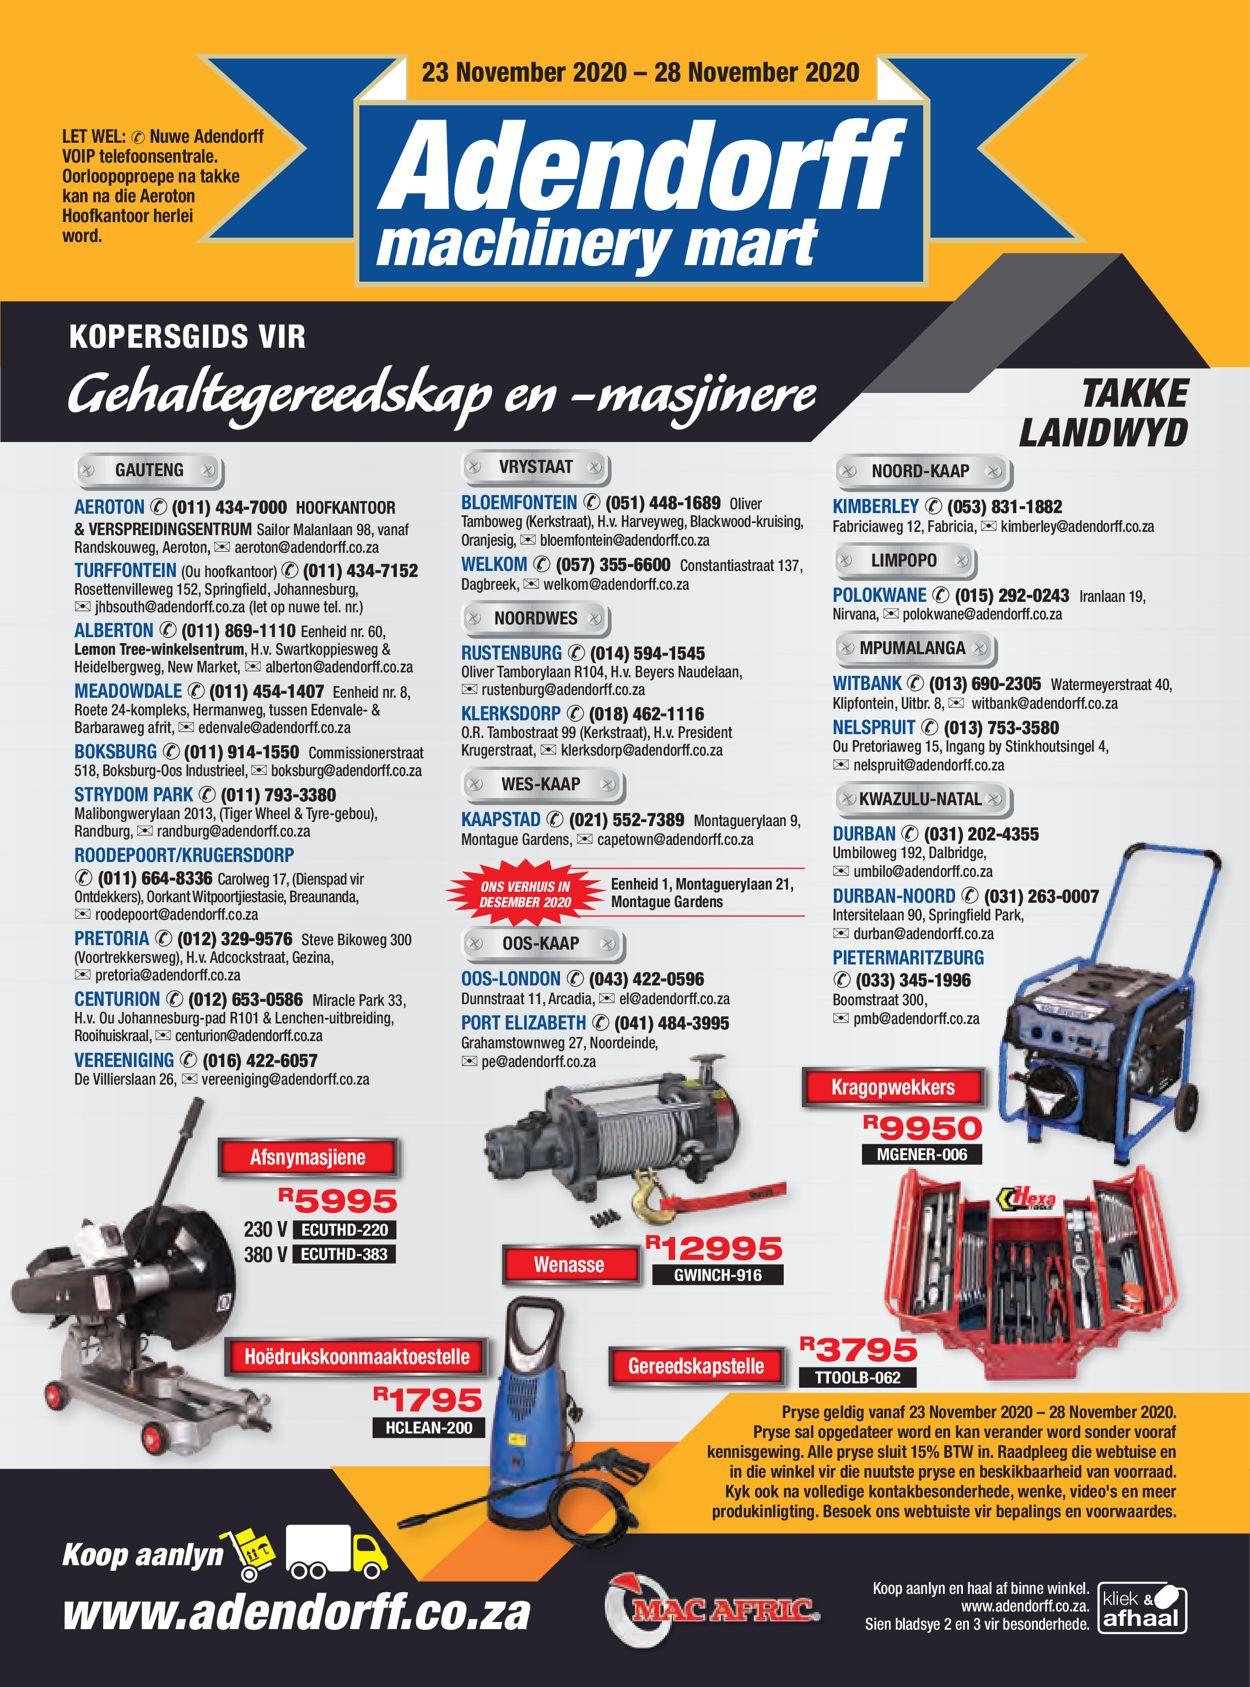 Adendorff Machinery Mart Black Friday 2020 Catalogue - 2020/11/23-2020/11/28